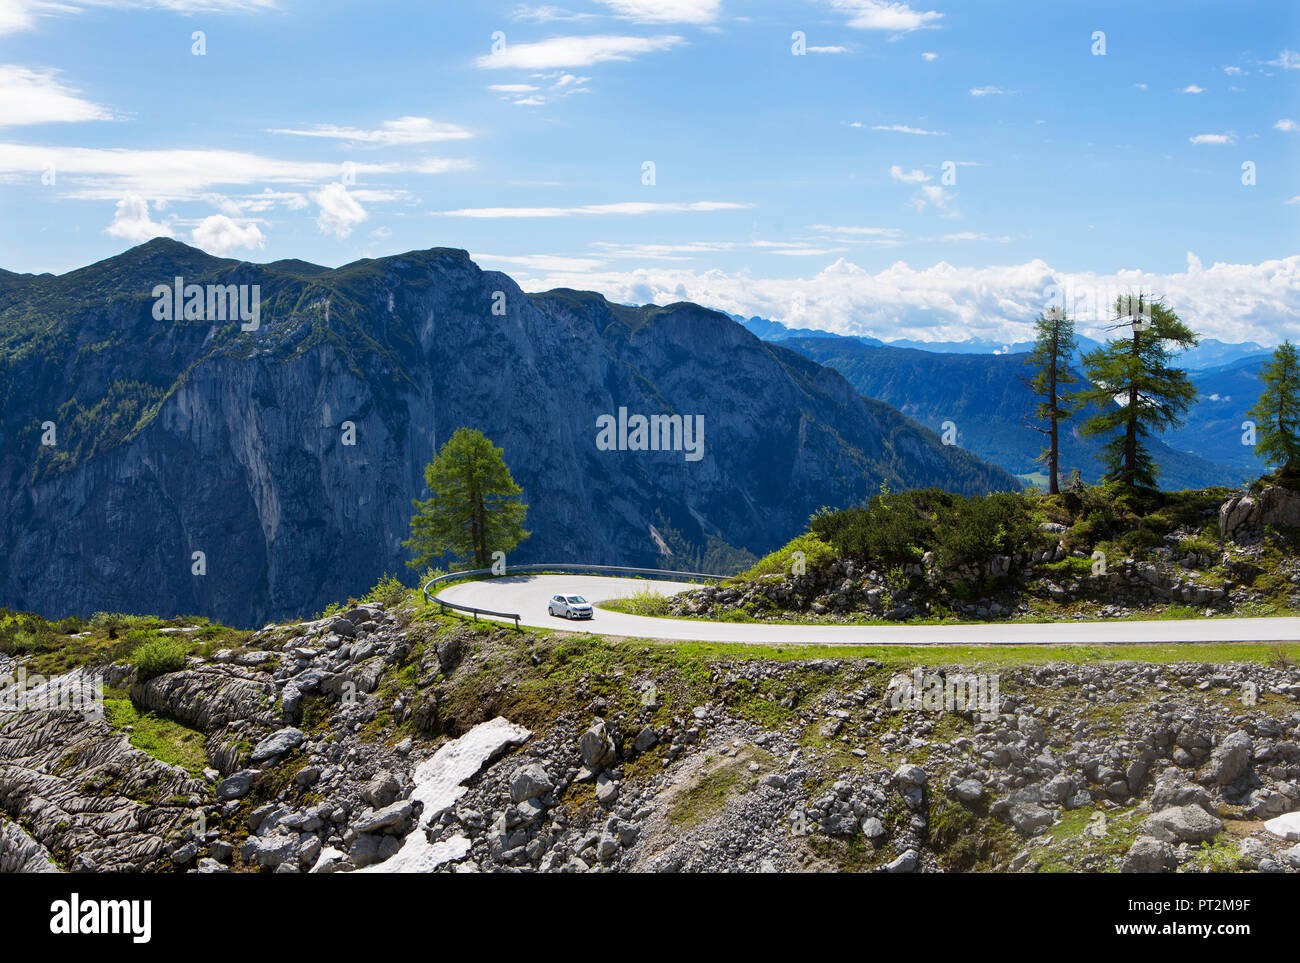 Austria, Styria, Salzkammergut, Ausseerland, Altaussee, View from the Loser Panoramastraße to Ausseerland and the Trisselwand - Stock Image